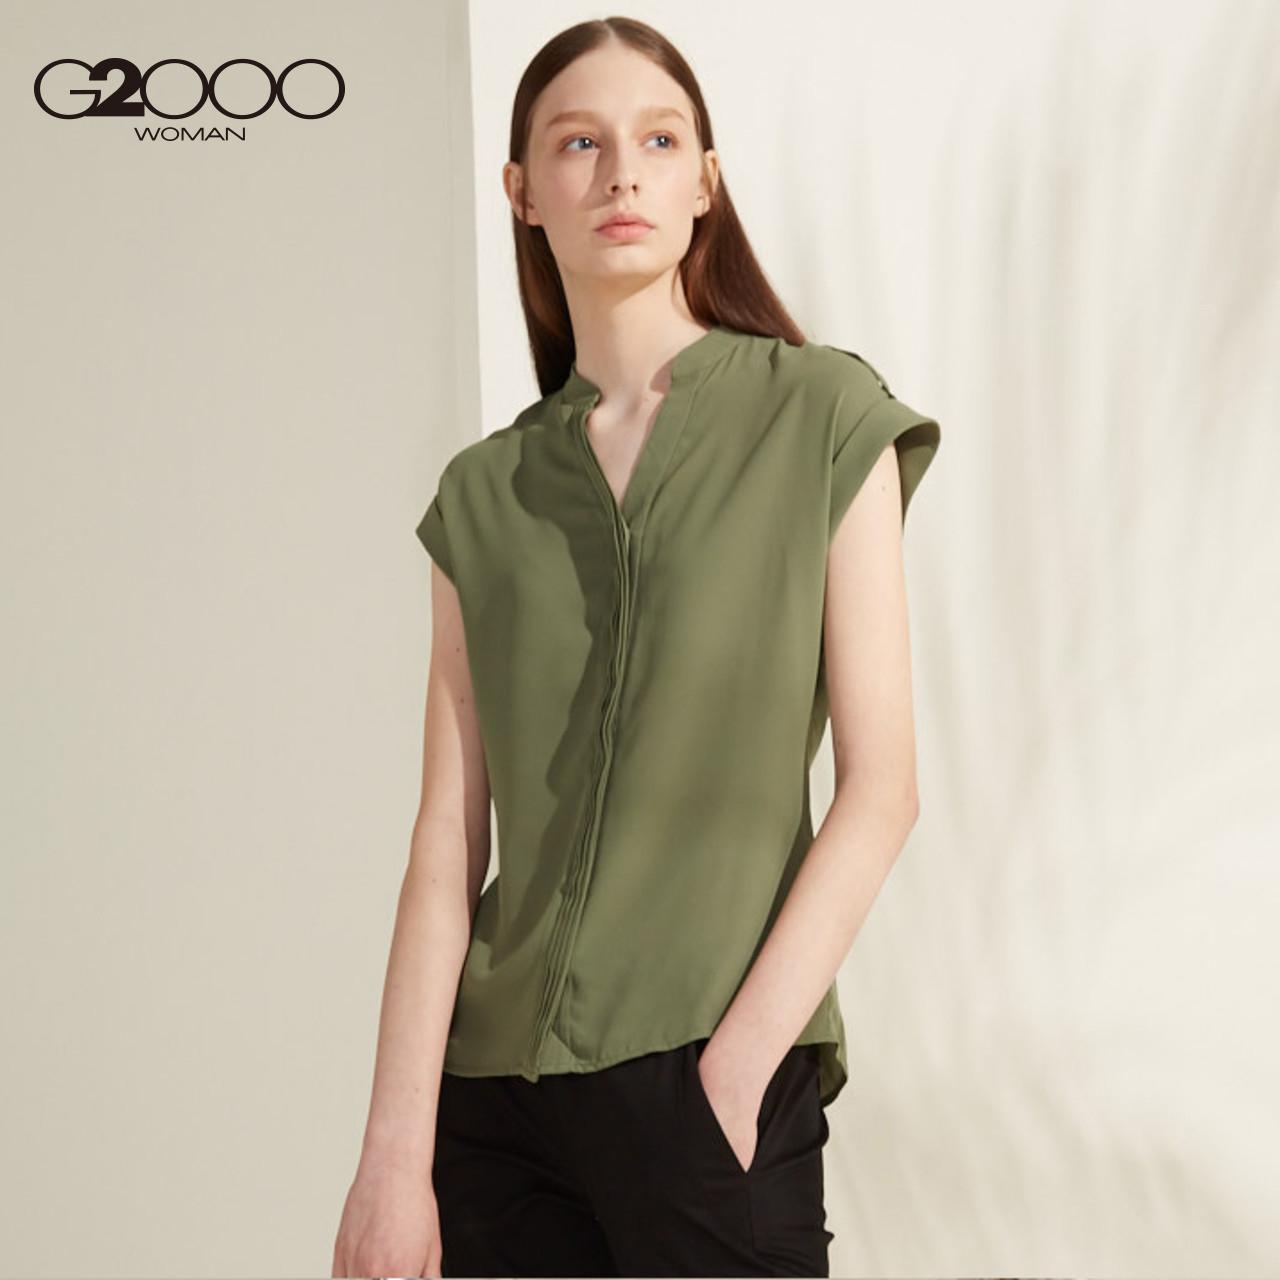 G2000女装短袖衬衫 2018春夏新款纯色V型小立领商务通勤休闲上衣